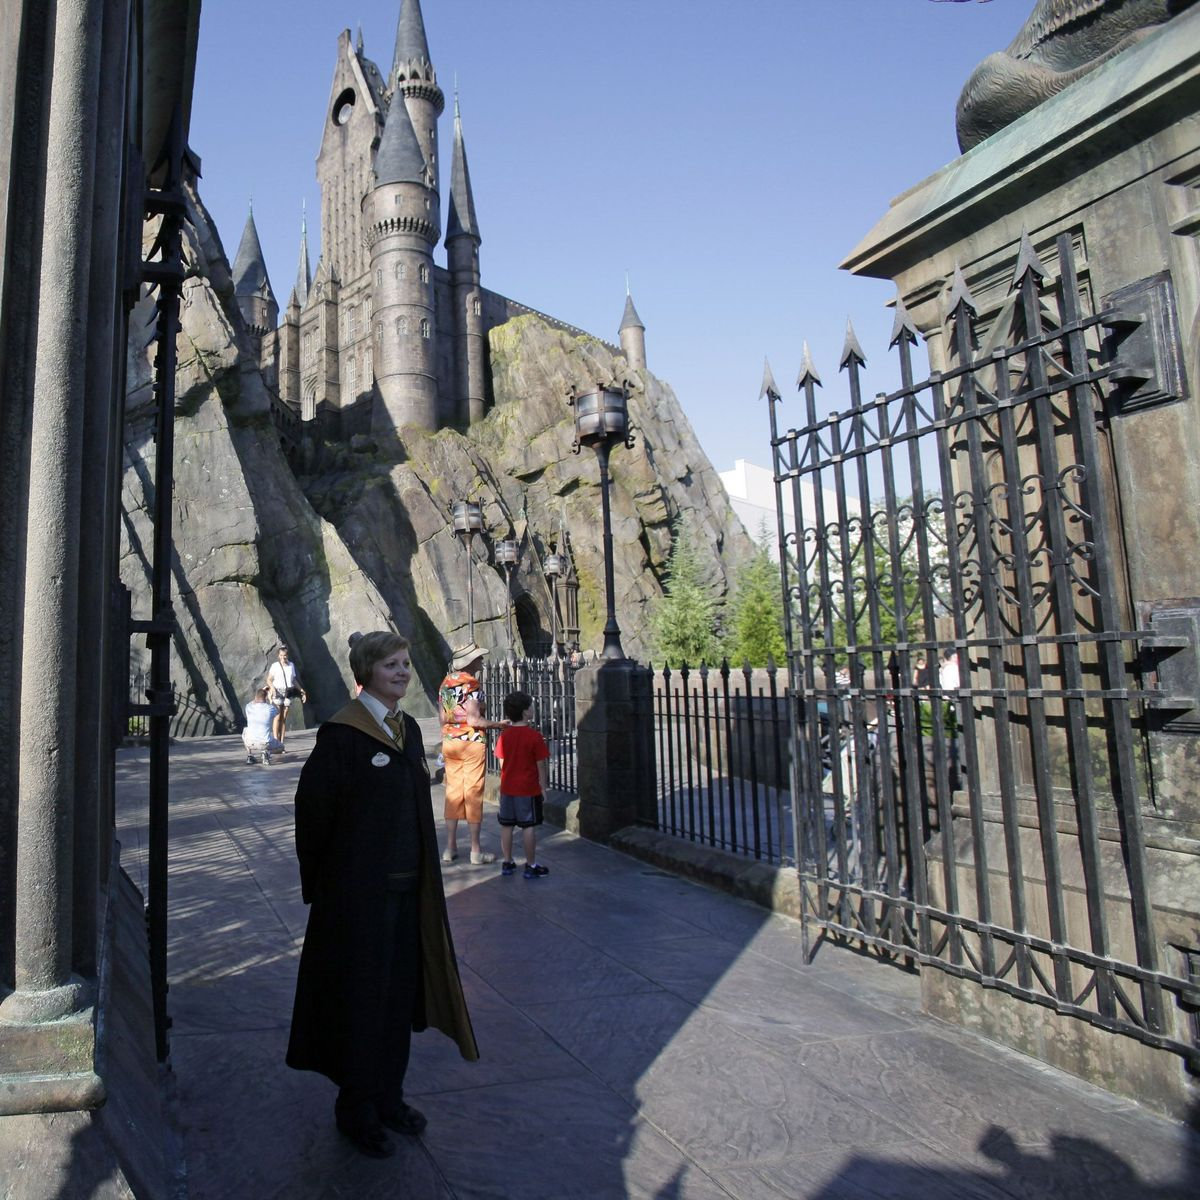 Eroffnung Des Harry Potter Parks Muggels Willkommen Der Spiegel